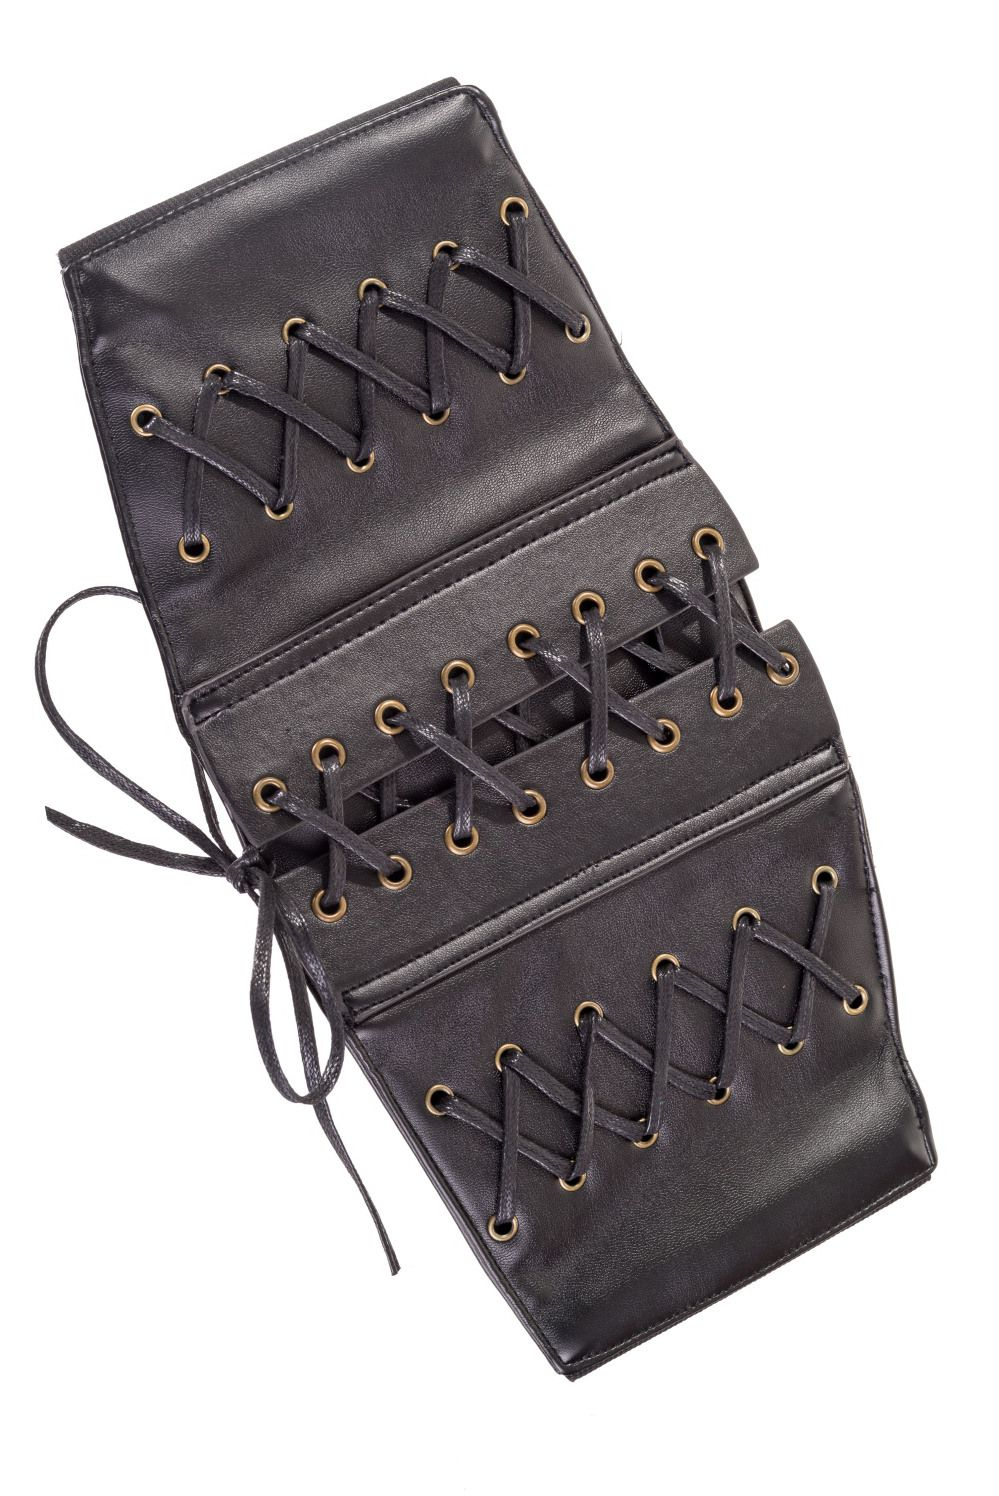 BNAC2221_ceinture-gothique-glam-rock-allure